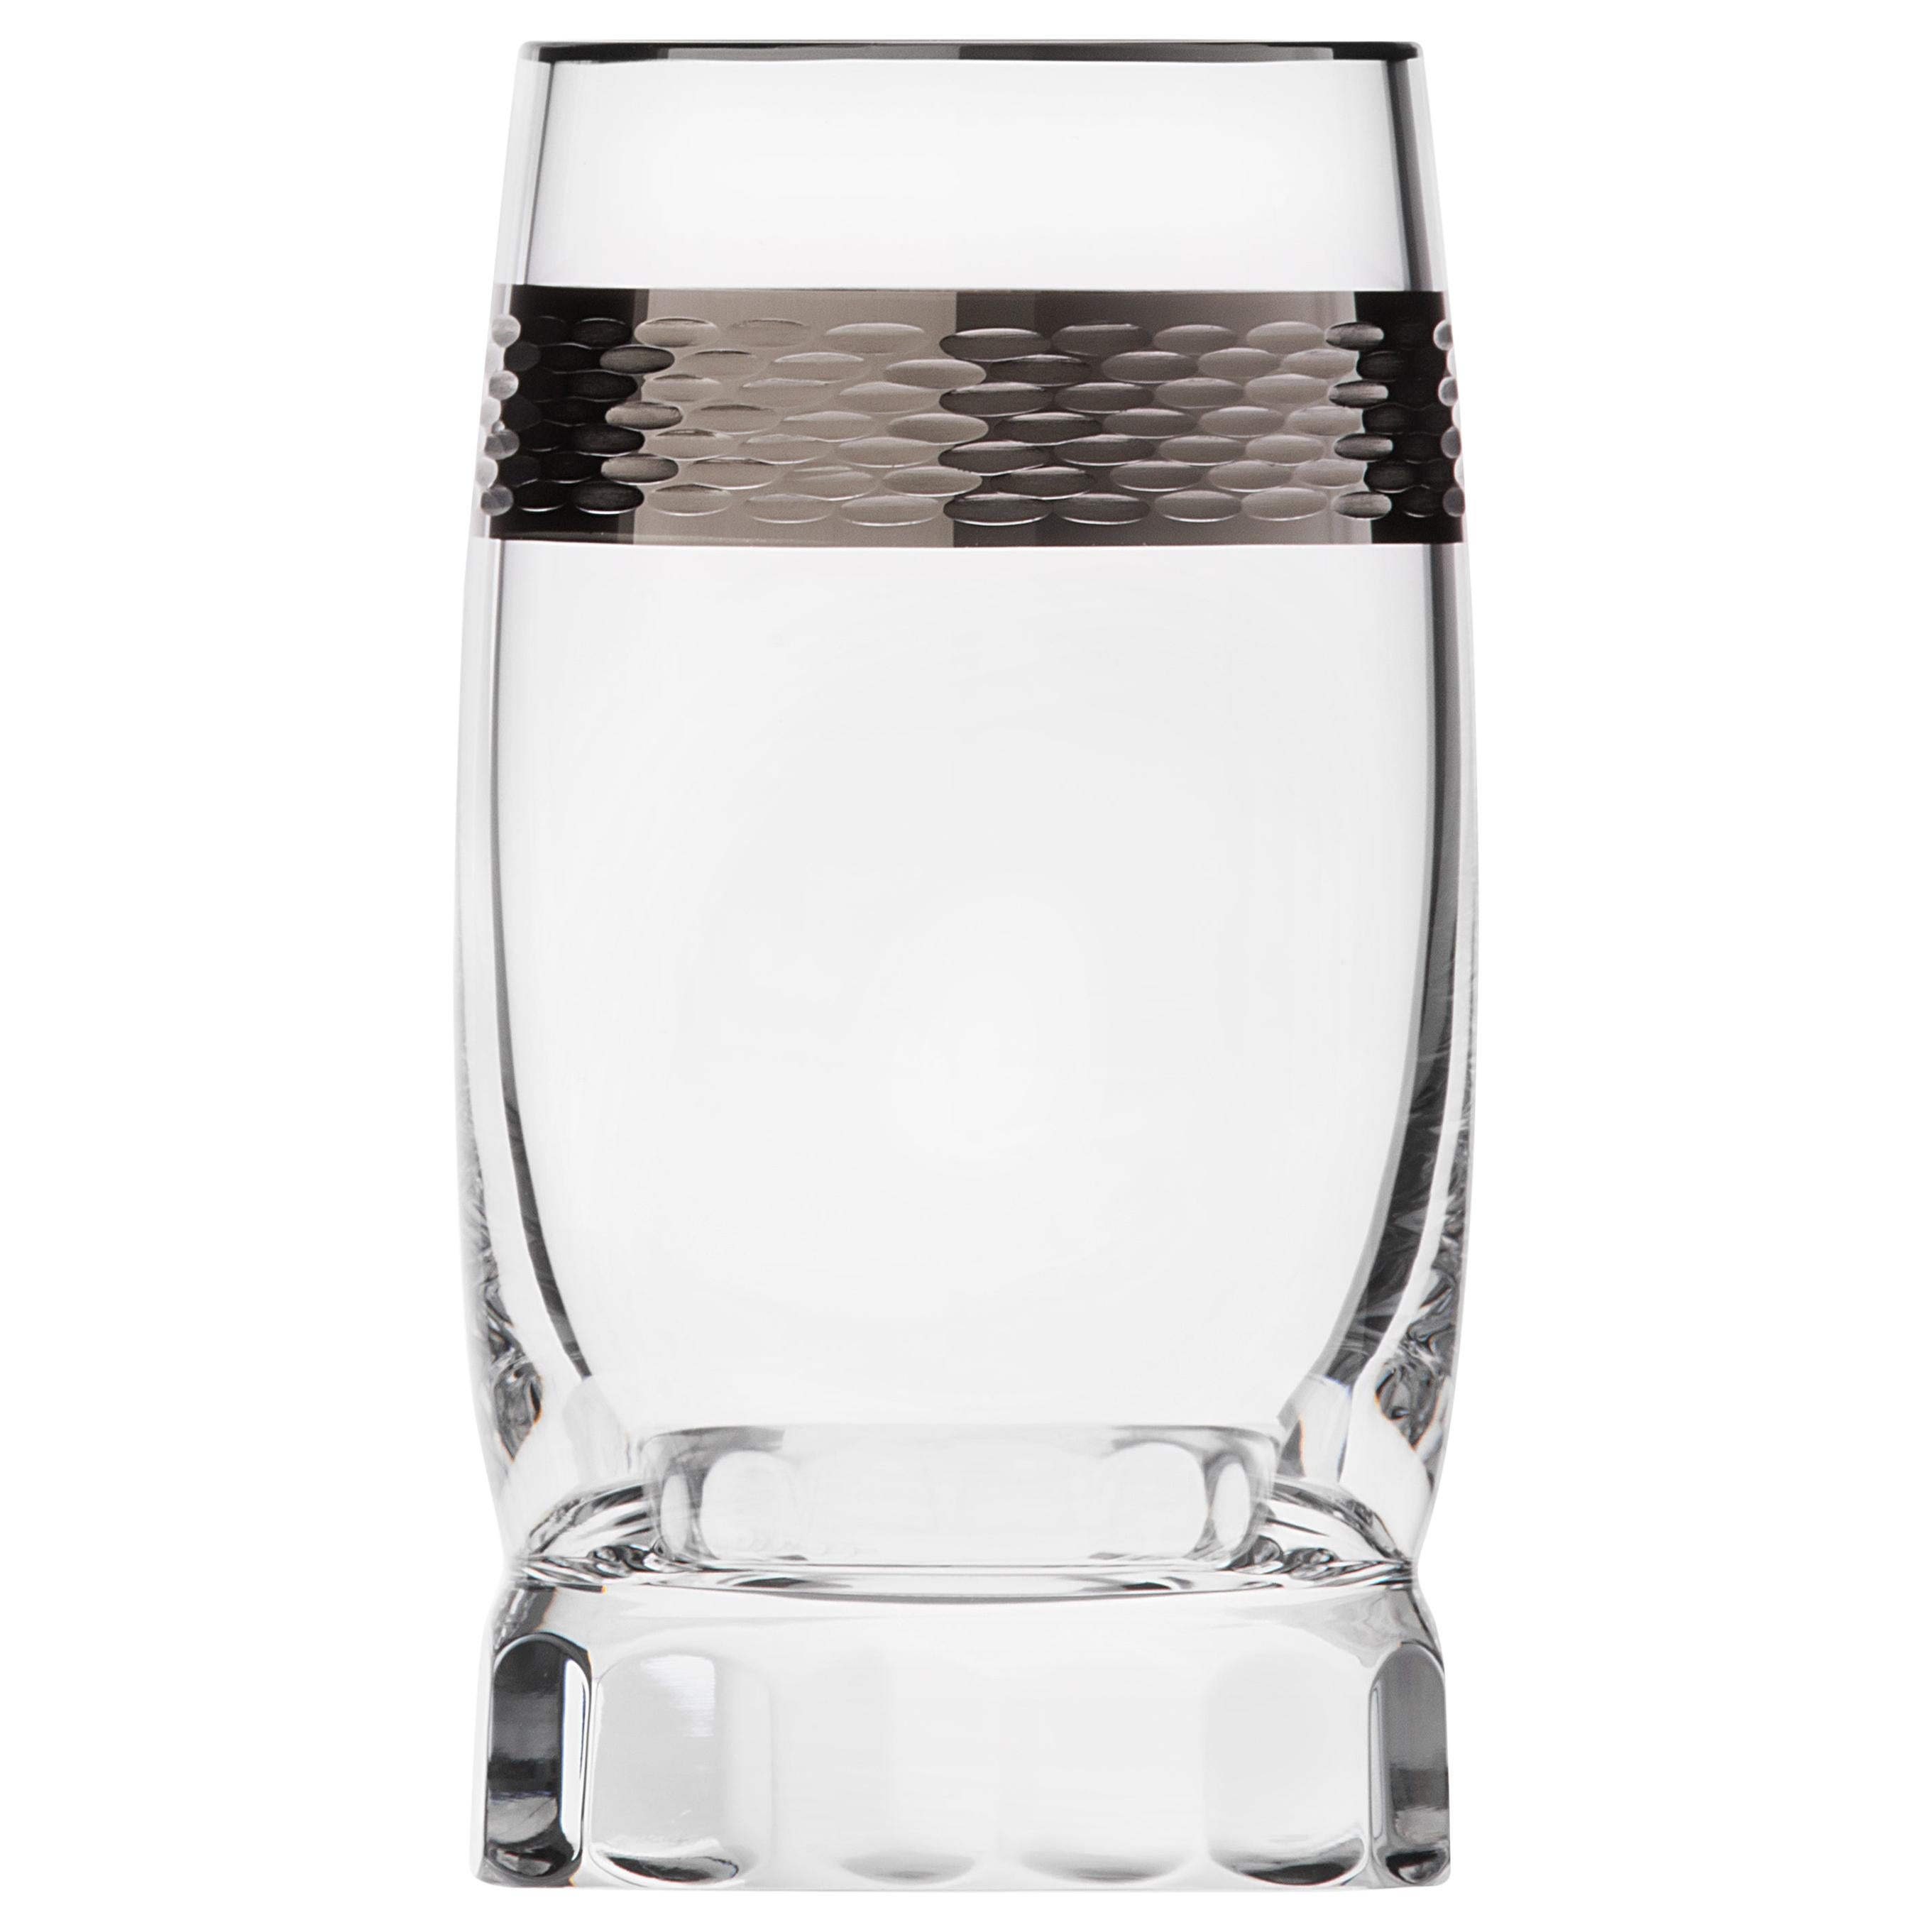 Casanova Distillate Lead-Free Crystal Tumbler with Platinum Decor, 2.36 oz